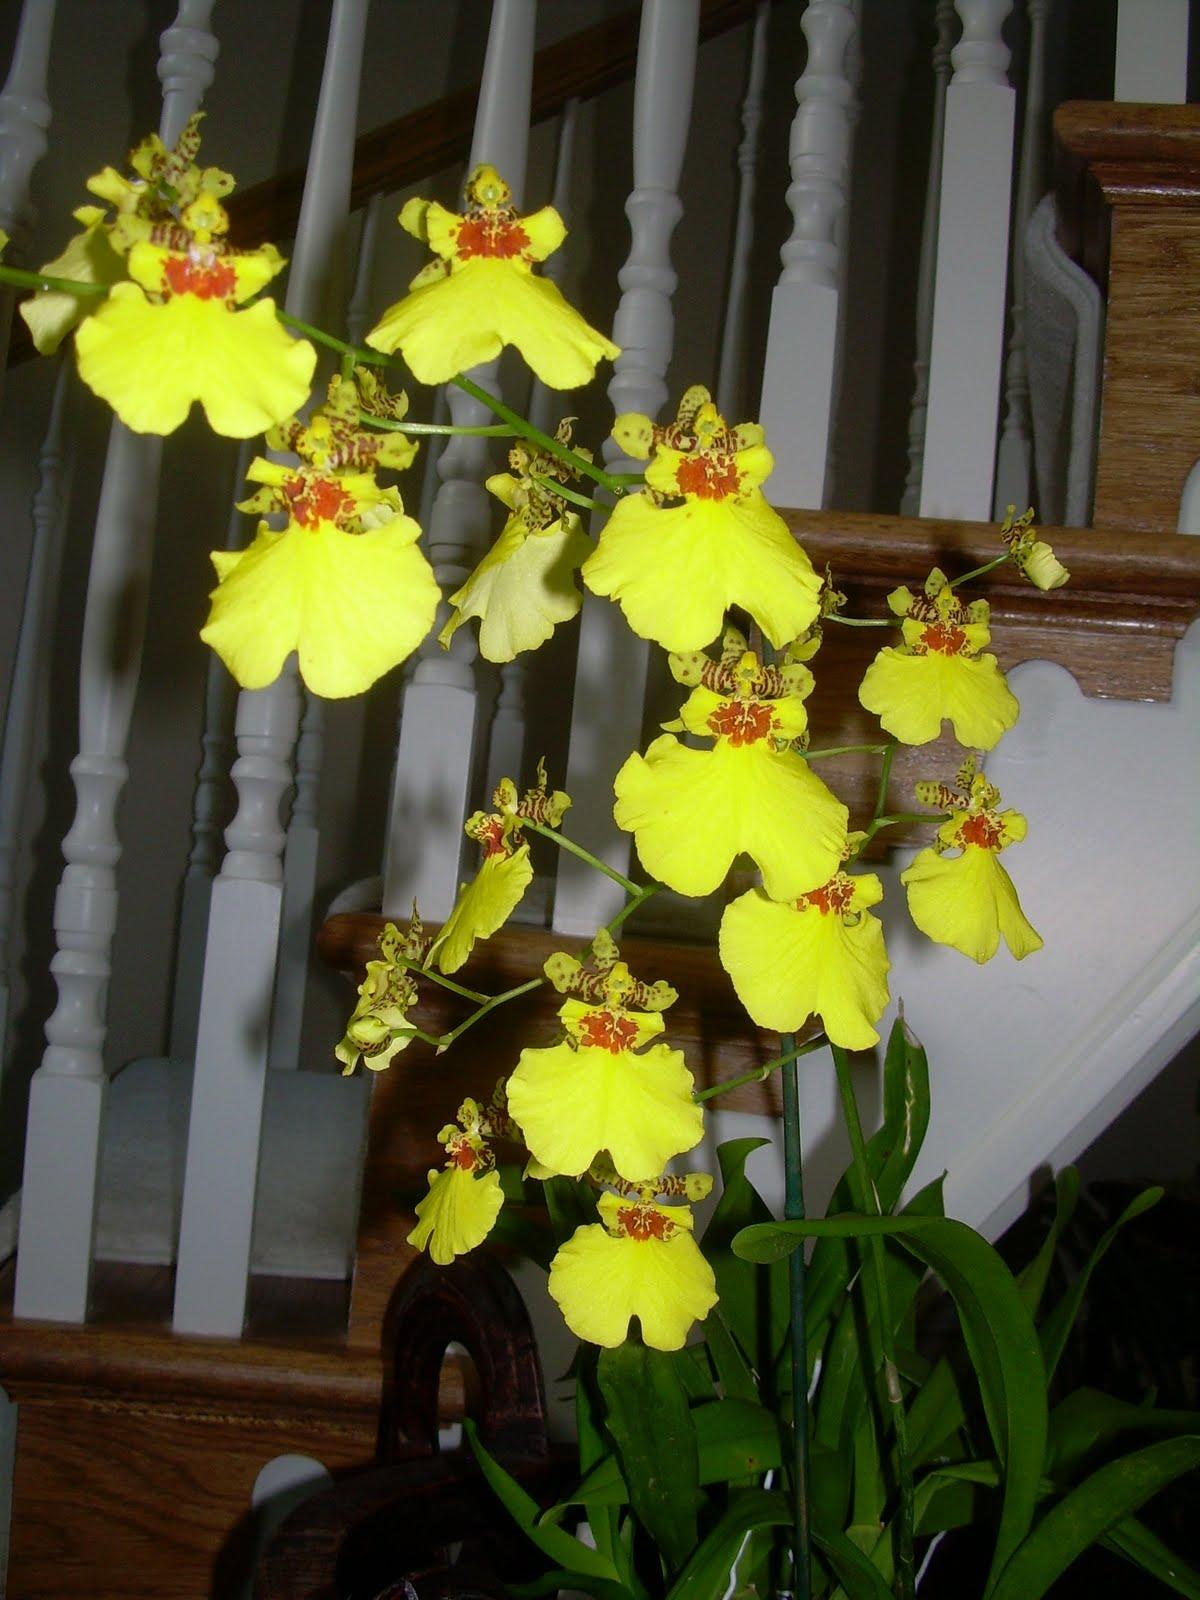 Orchids And Ikebana November 2010